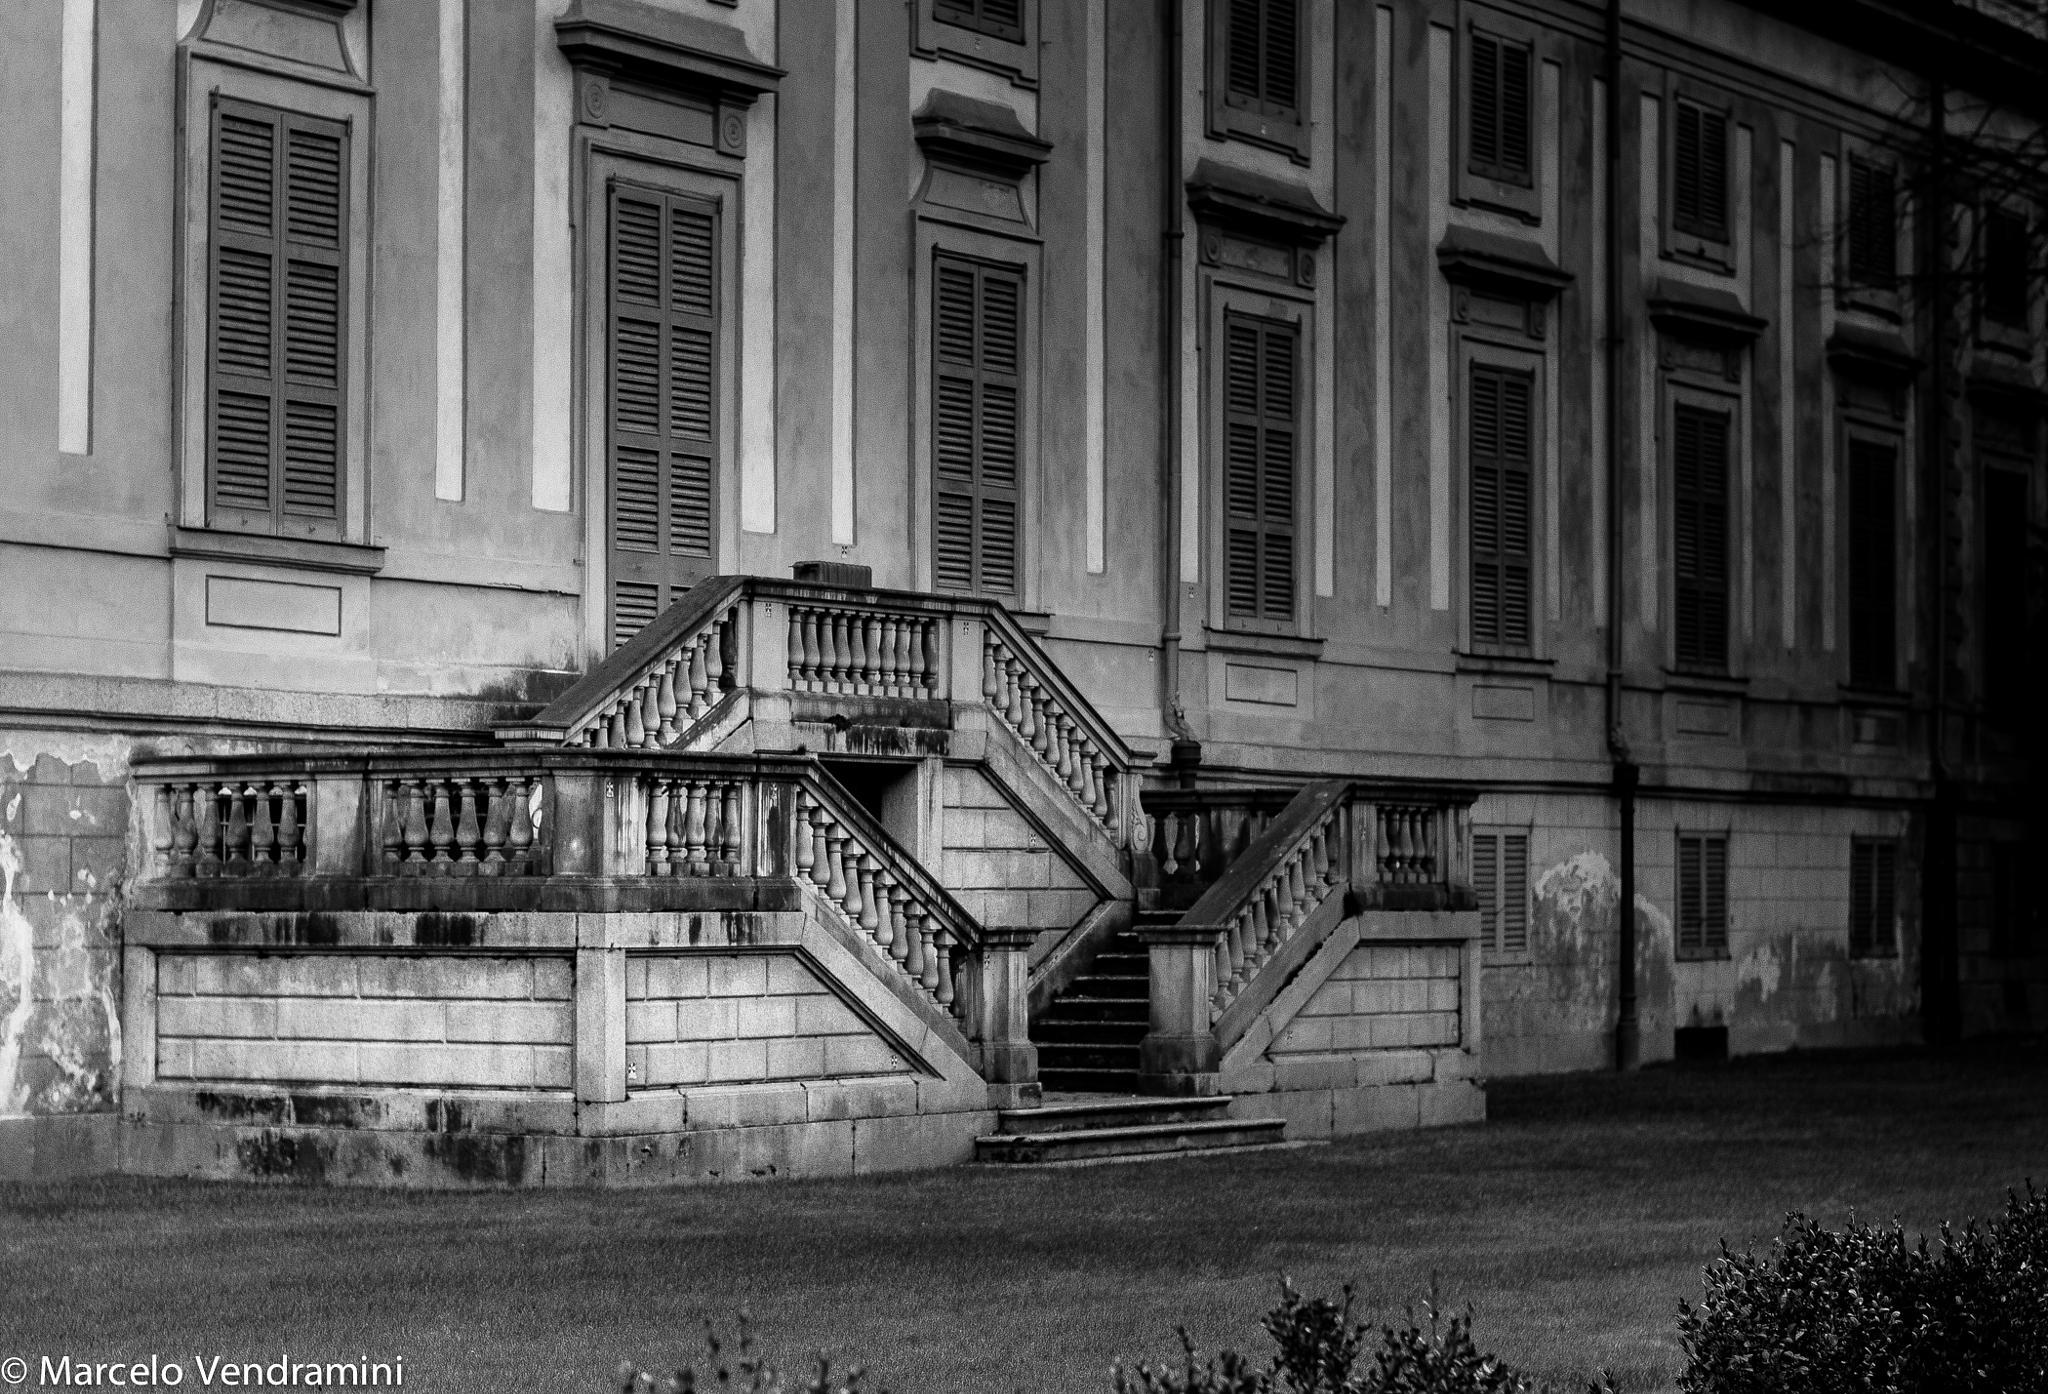 Royal Ville of Monza by Marcelo Vendramini